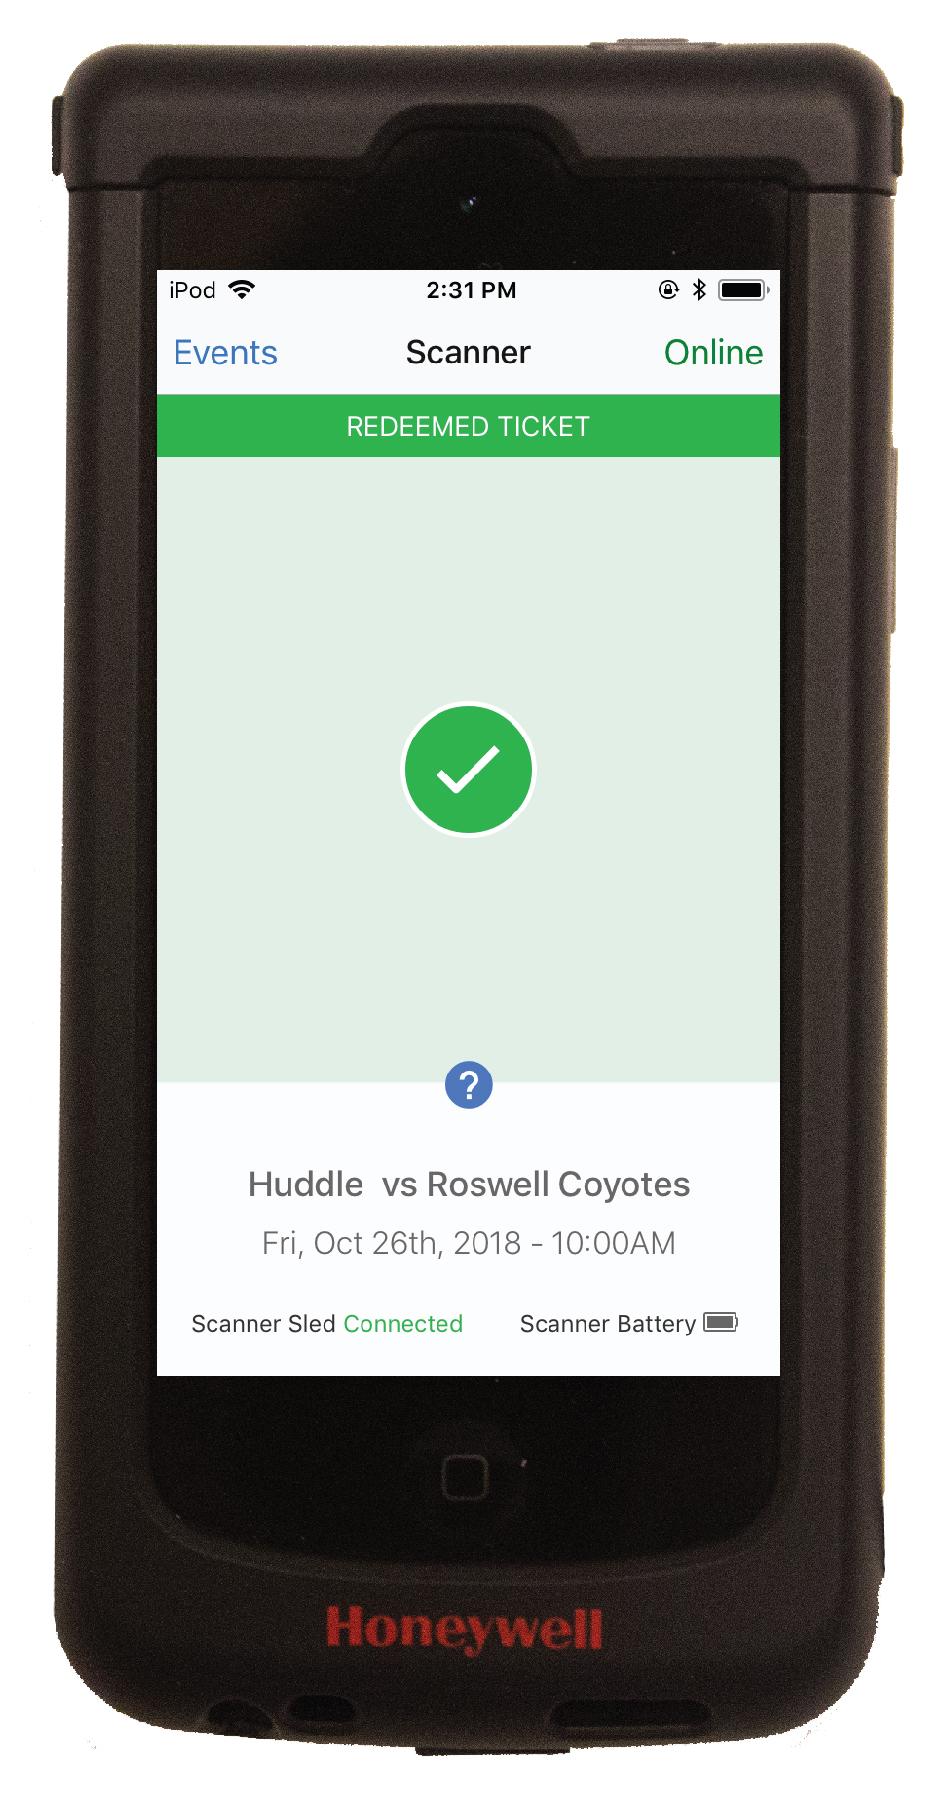 GoFan_ProScanningMockups_Green Check.jpg